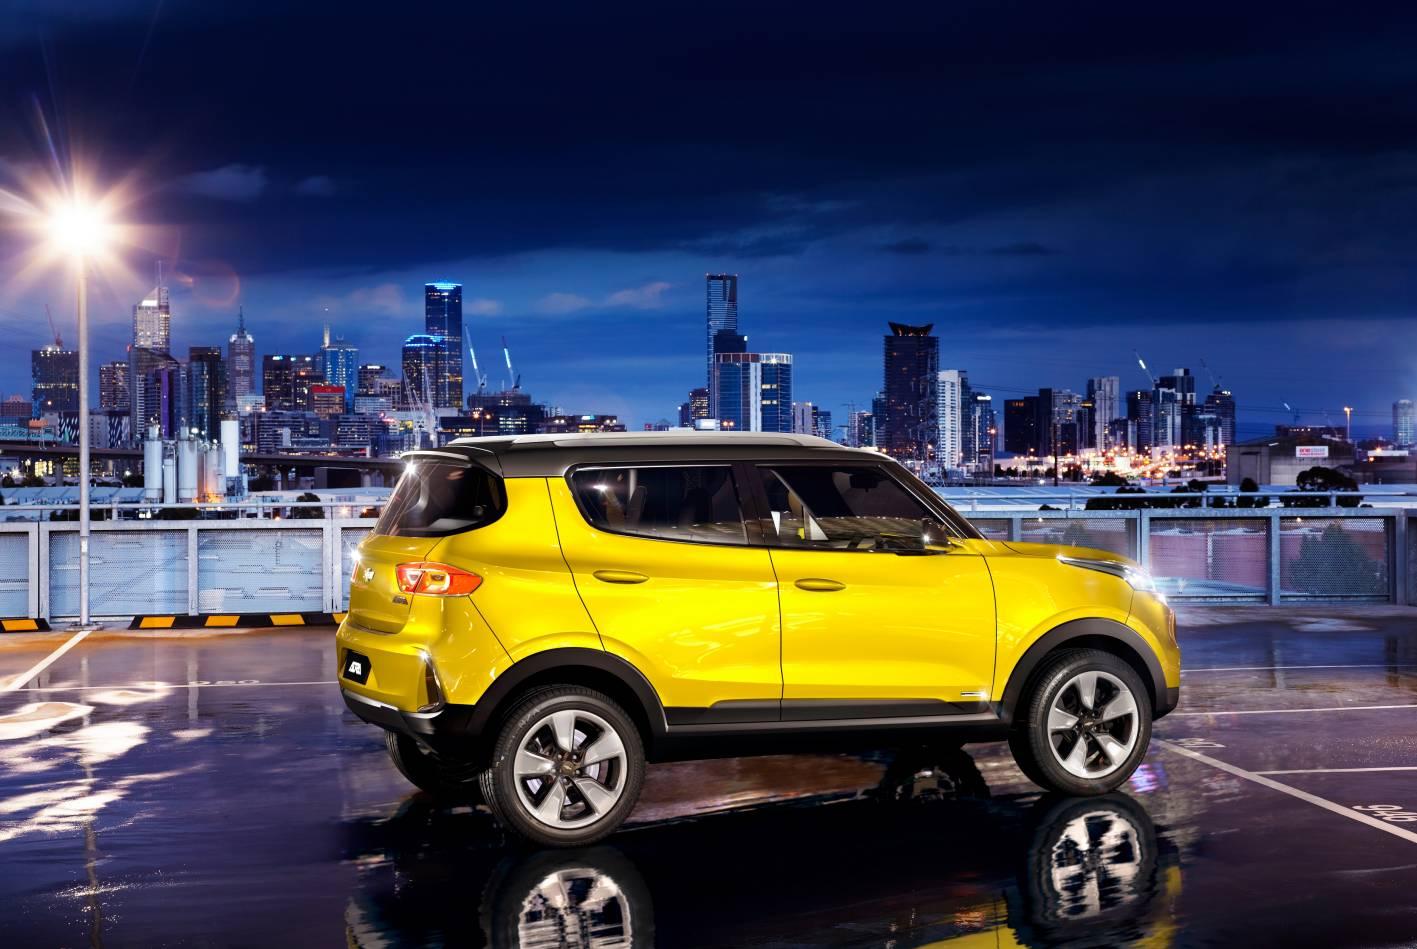 Chevrolet Cars - News: Chevrolet Adra small SUV for India